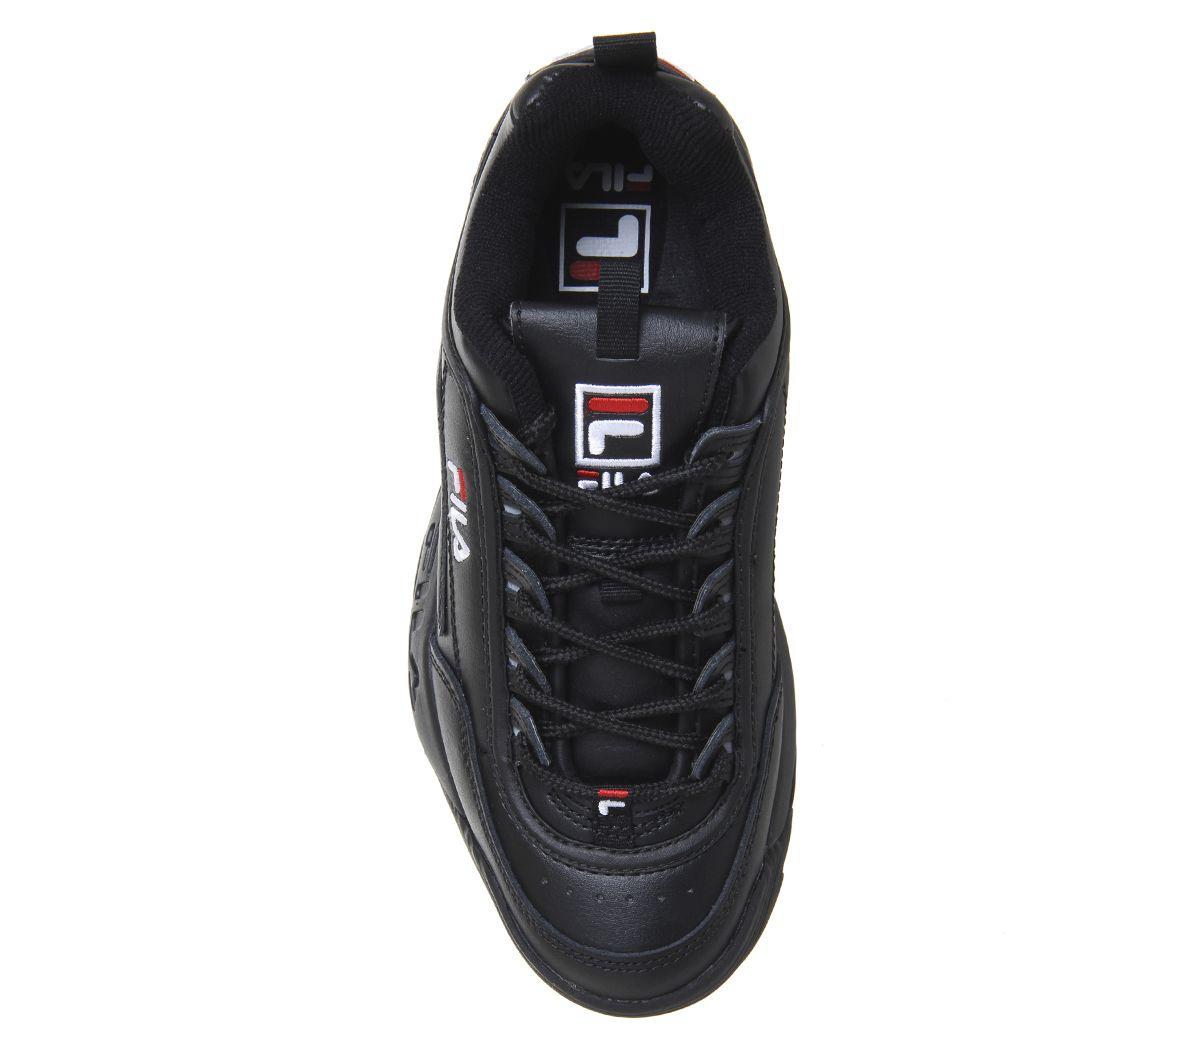 Donna-Fila-Disruptor-II-Scarpe-Sportive-Nero-Mono-Scarpe-da-Ginnastica miniatura 10